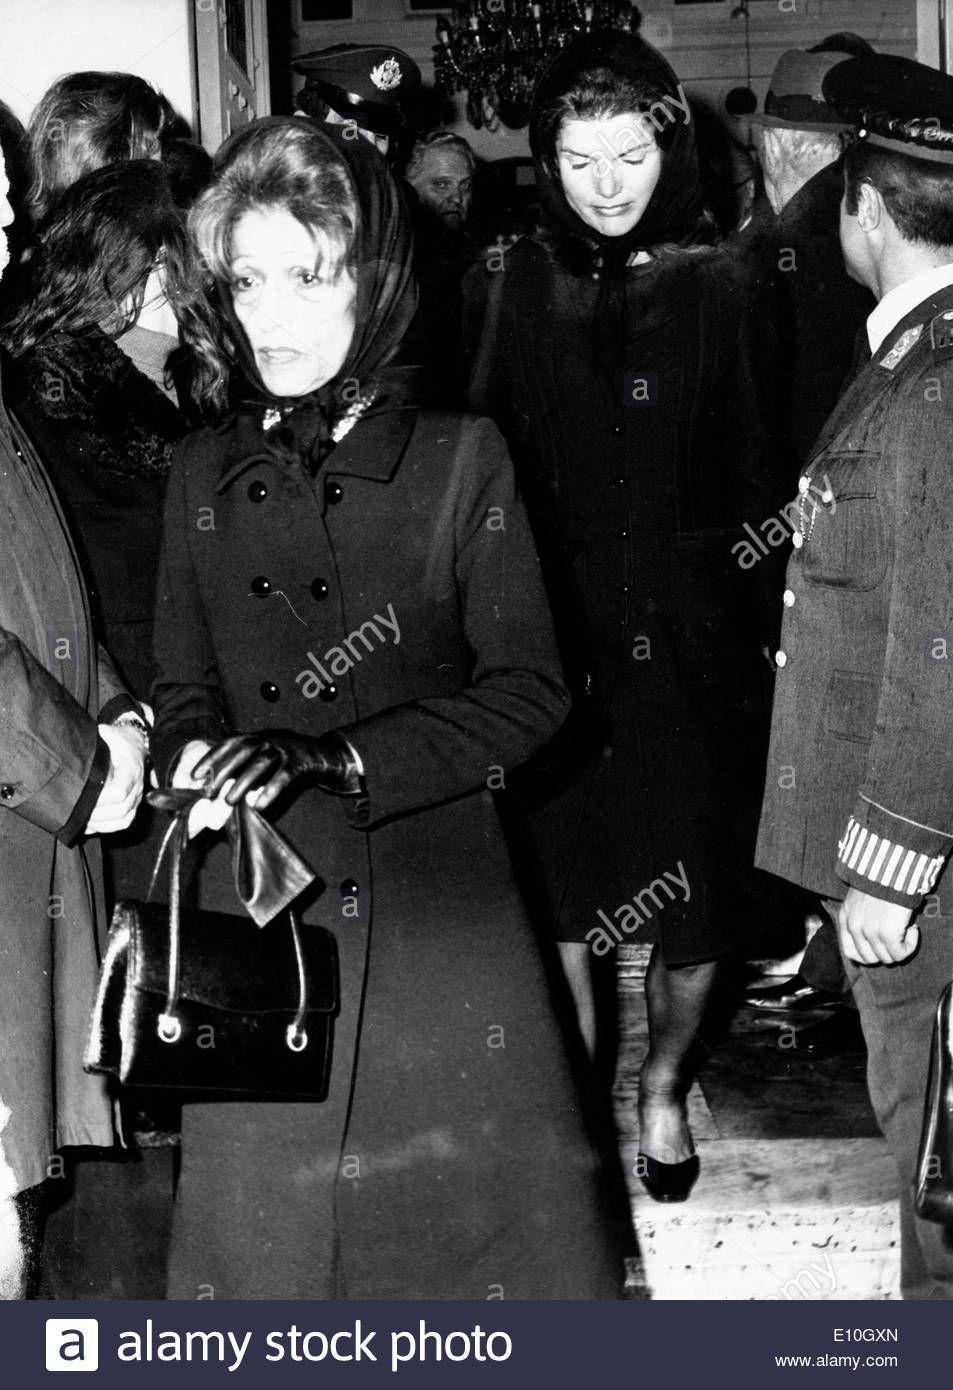 Jacqueline Kennedy Onassis Stock Photos & Jacqueline Kennedy ...